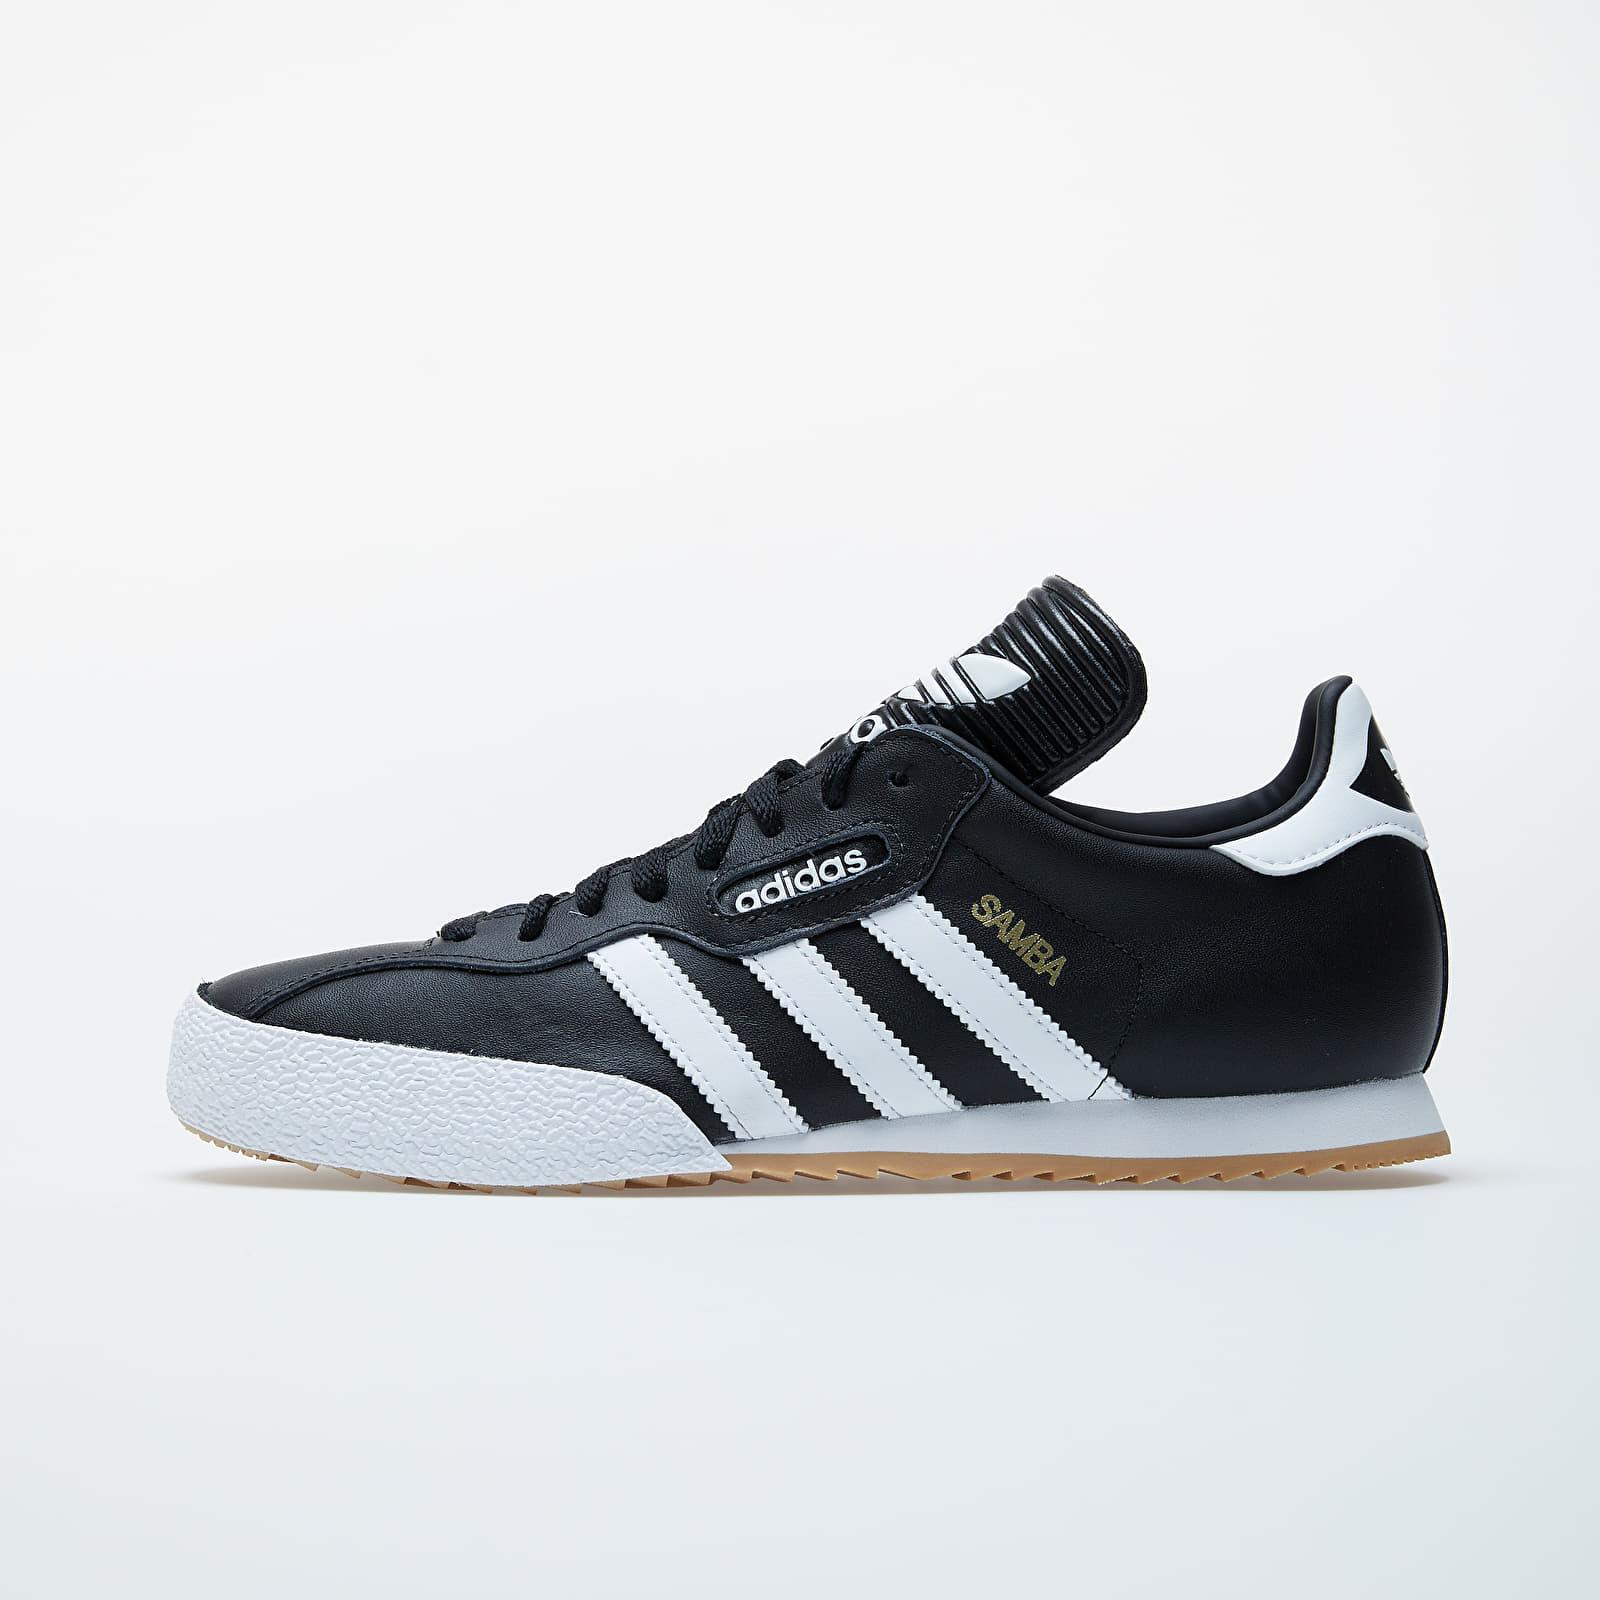 Men's shoes adidas Samba Super Black